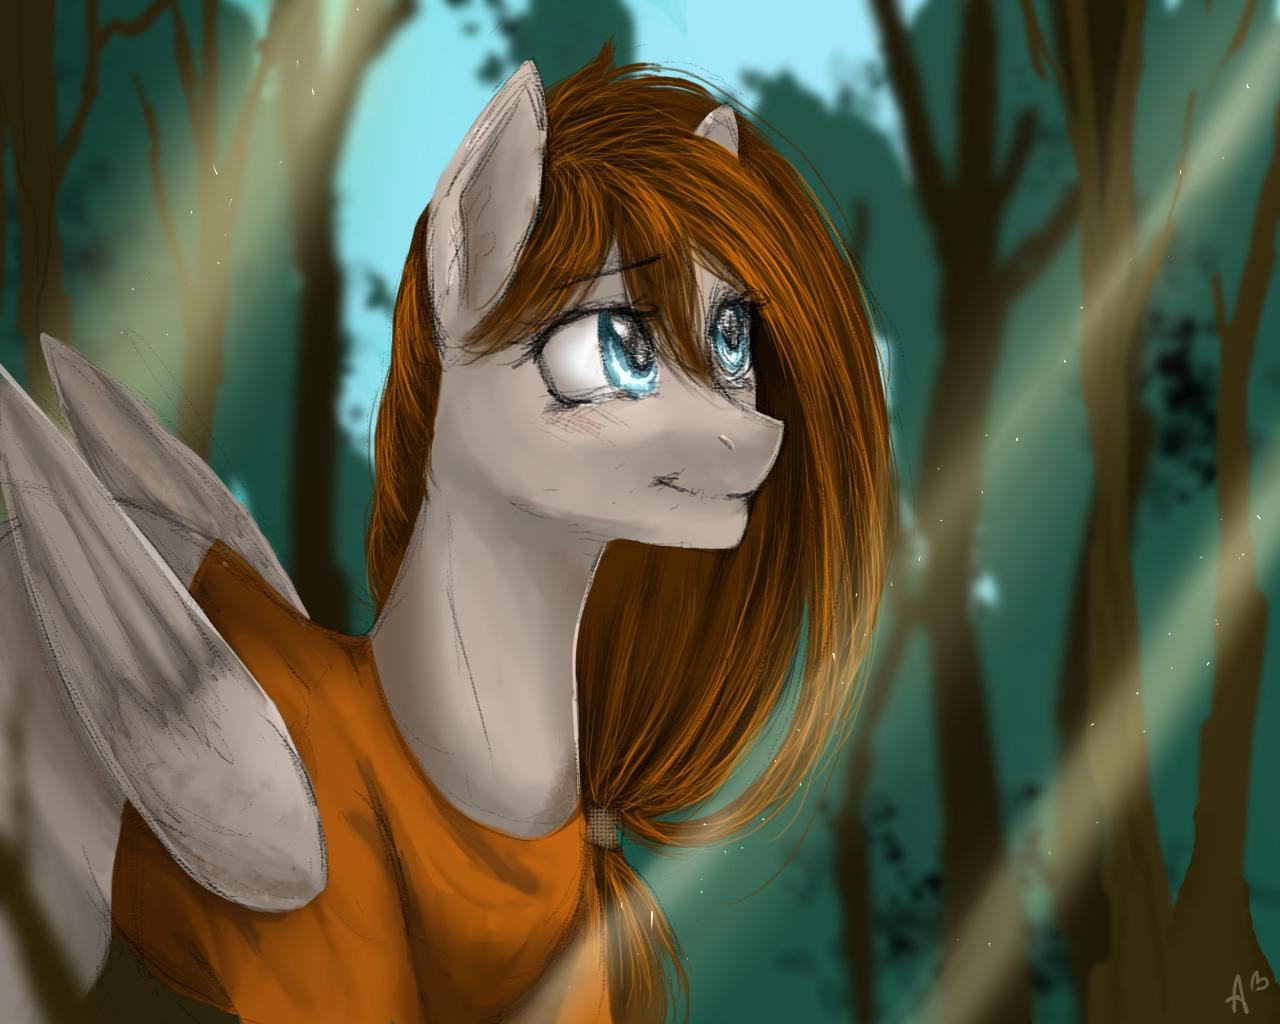 Walk in the forest by mrsElisSmitt